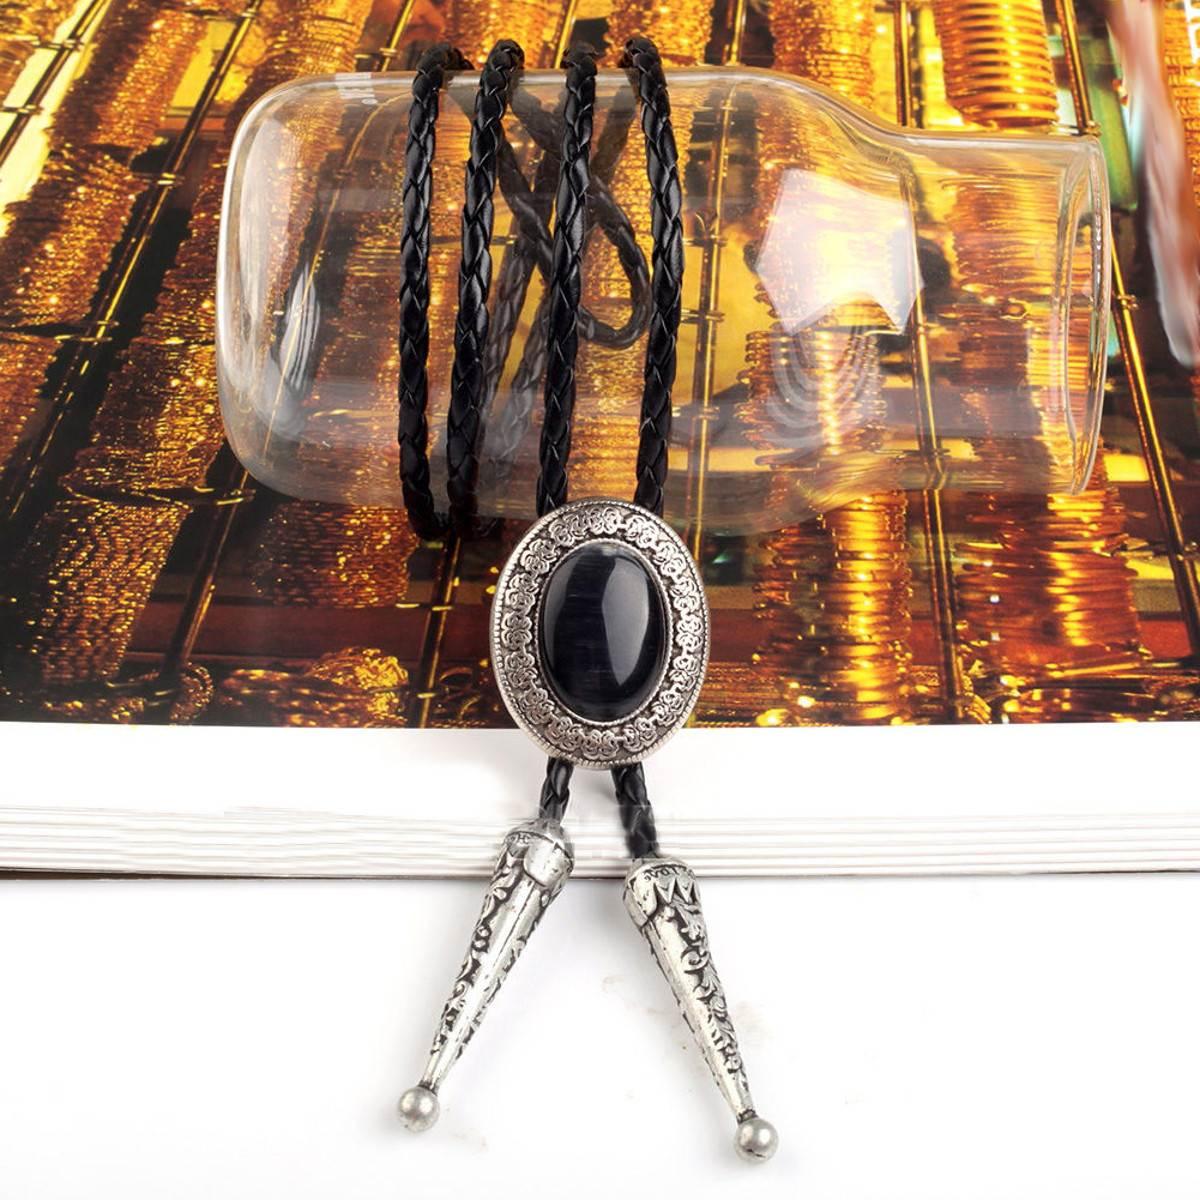 Vintage Enamel Silver Copper Mens Shirt Cufflinks and Necktie Tie Clip Set